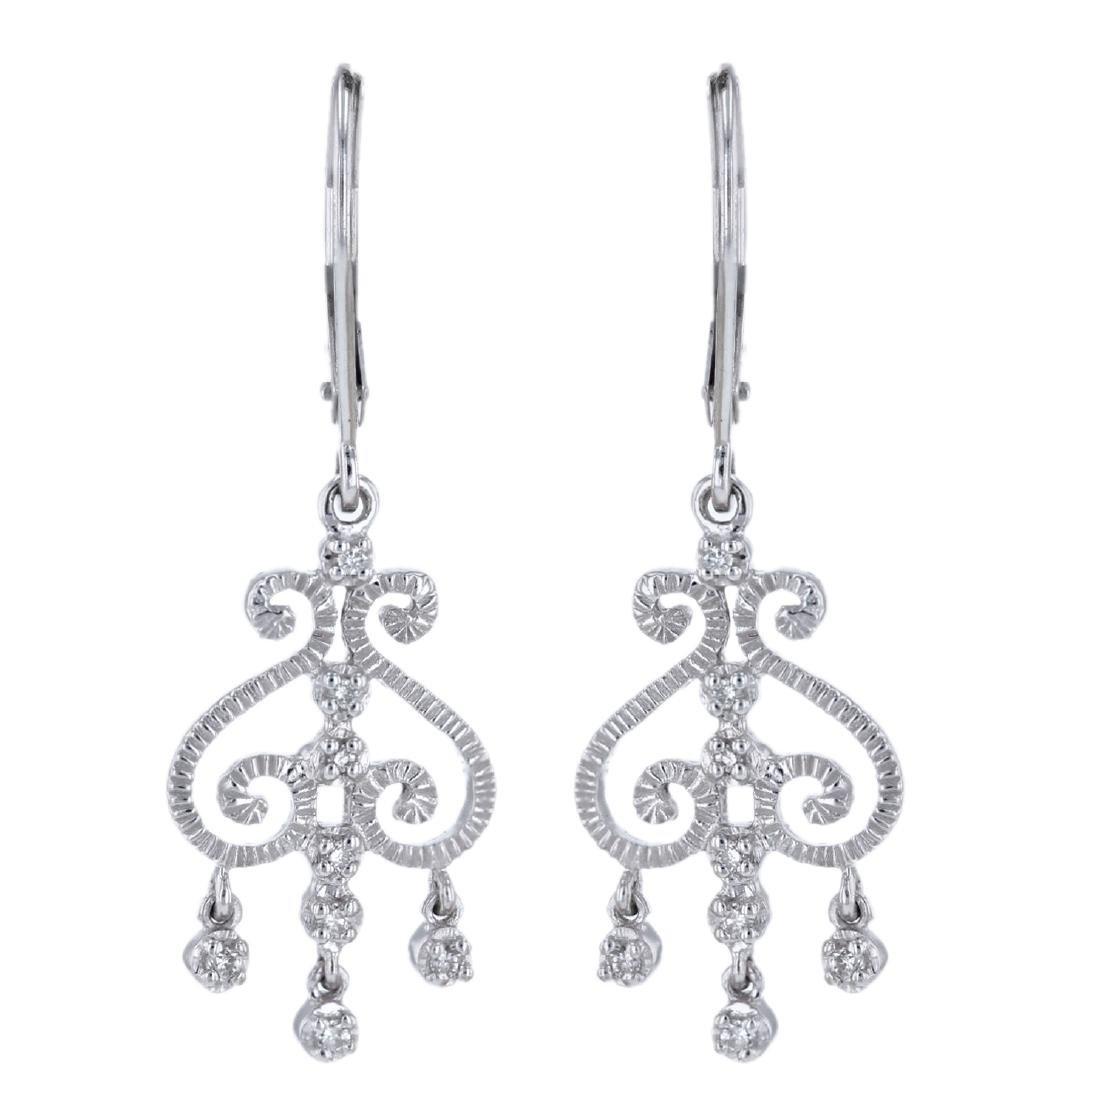 14KT White Gold 0.10ctw Diamond Chandelier Earrings